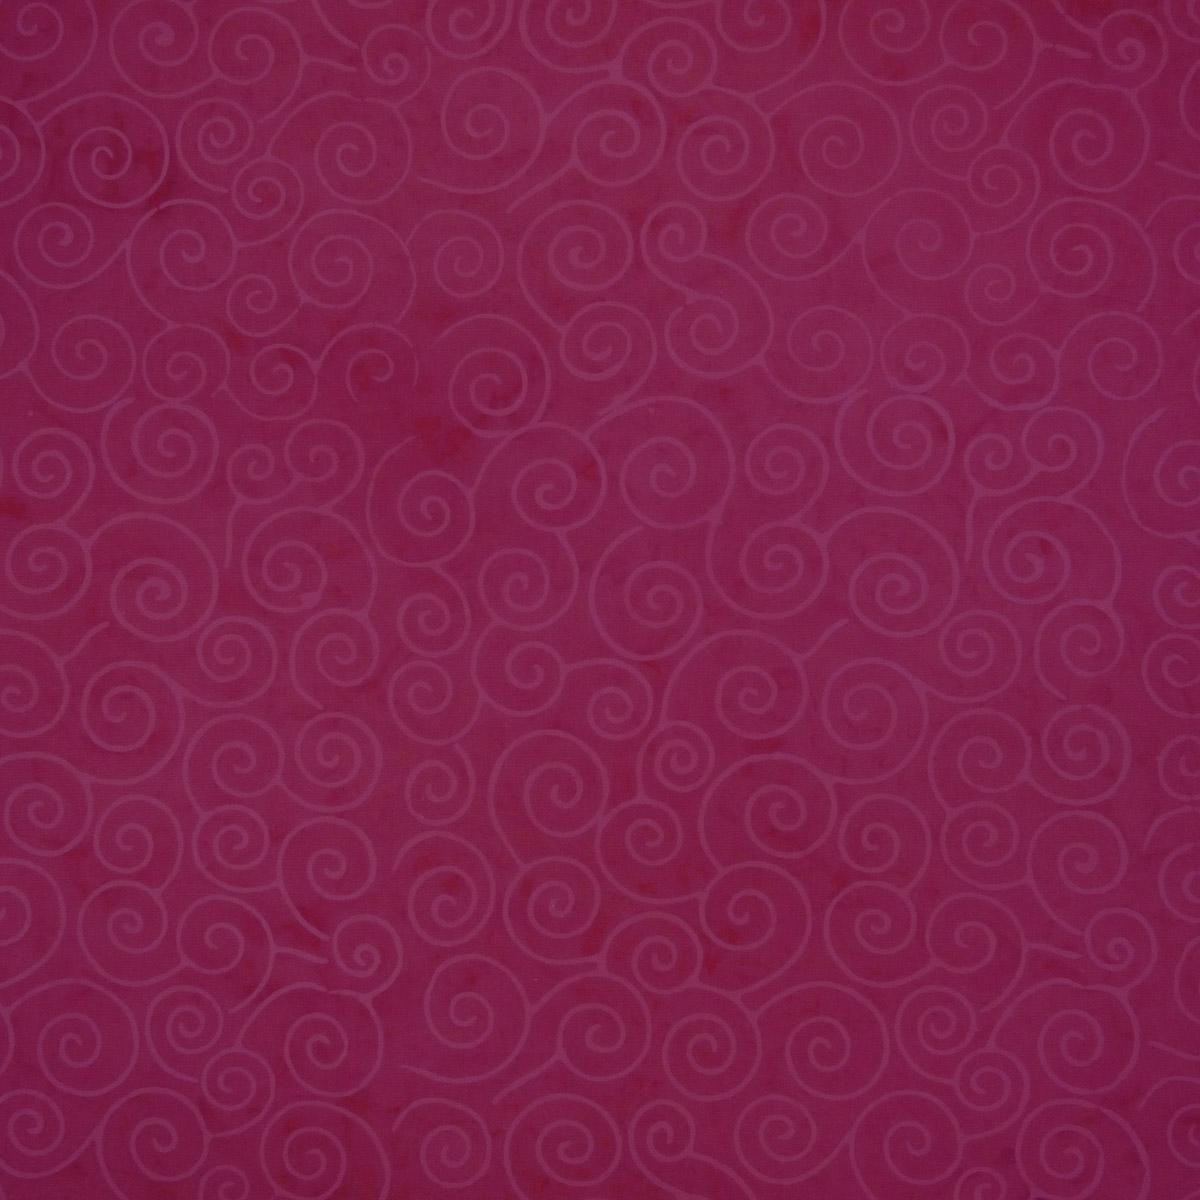 CS-4-6855-Ibis-Rose